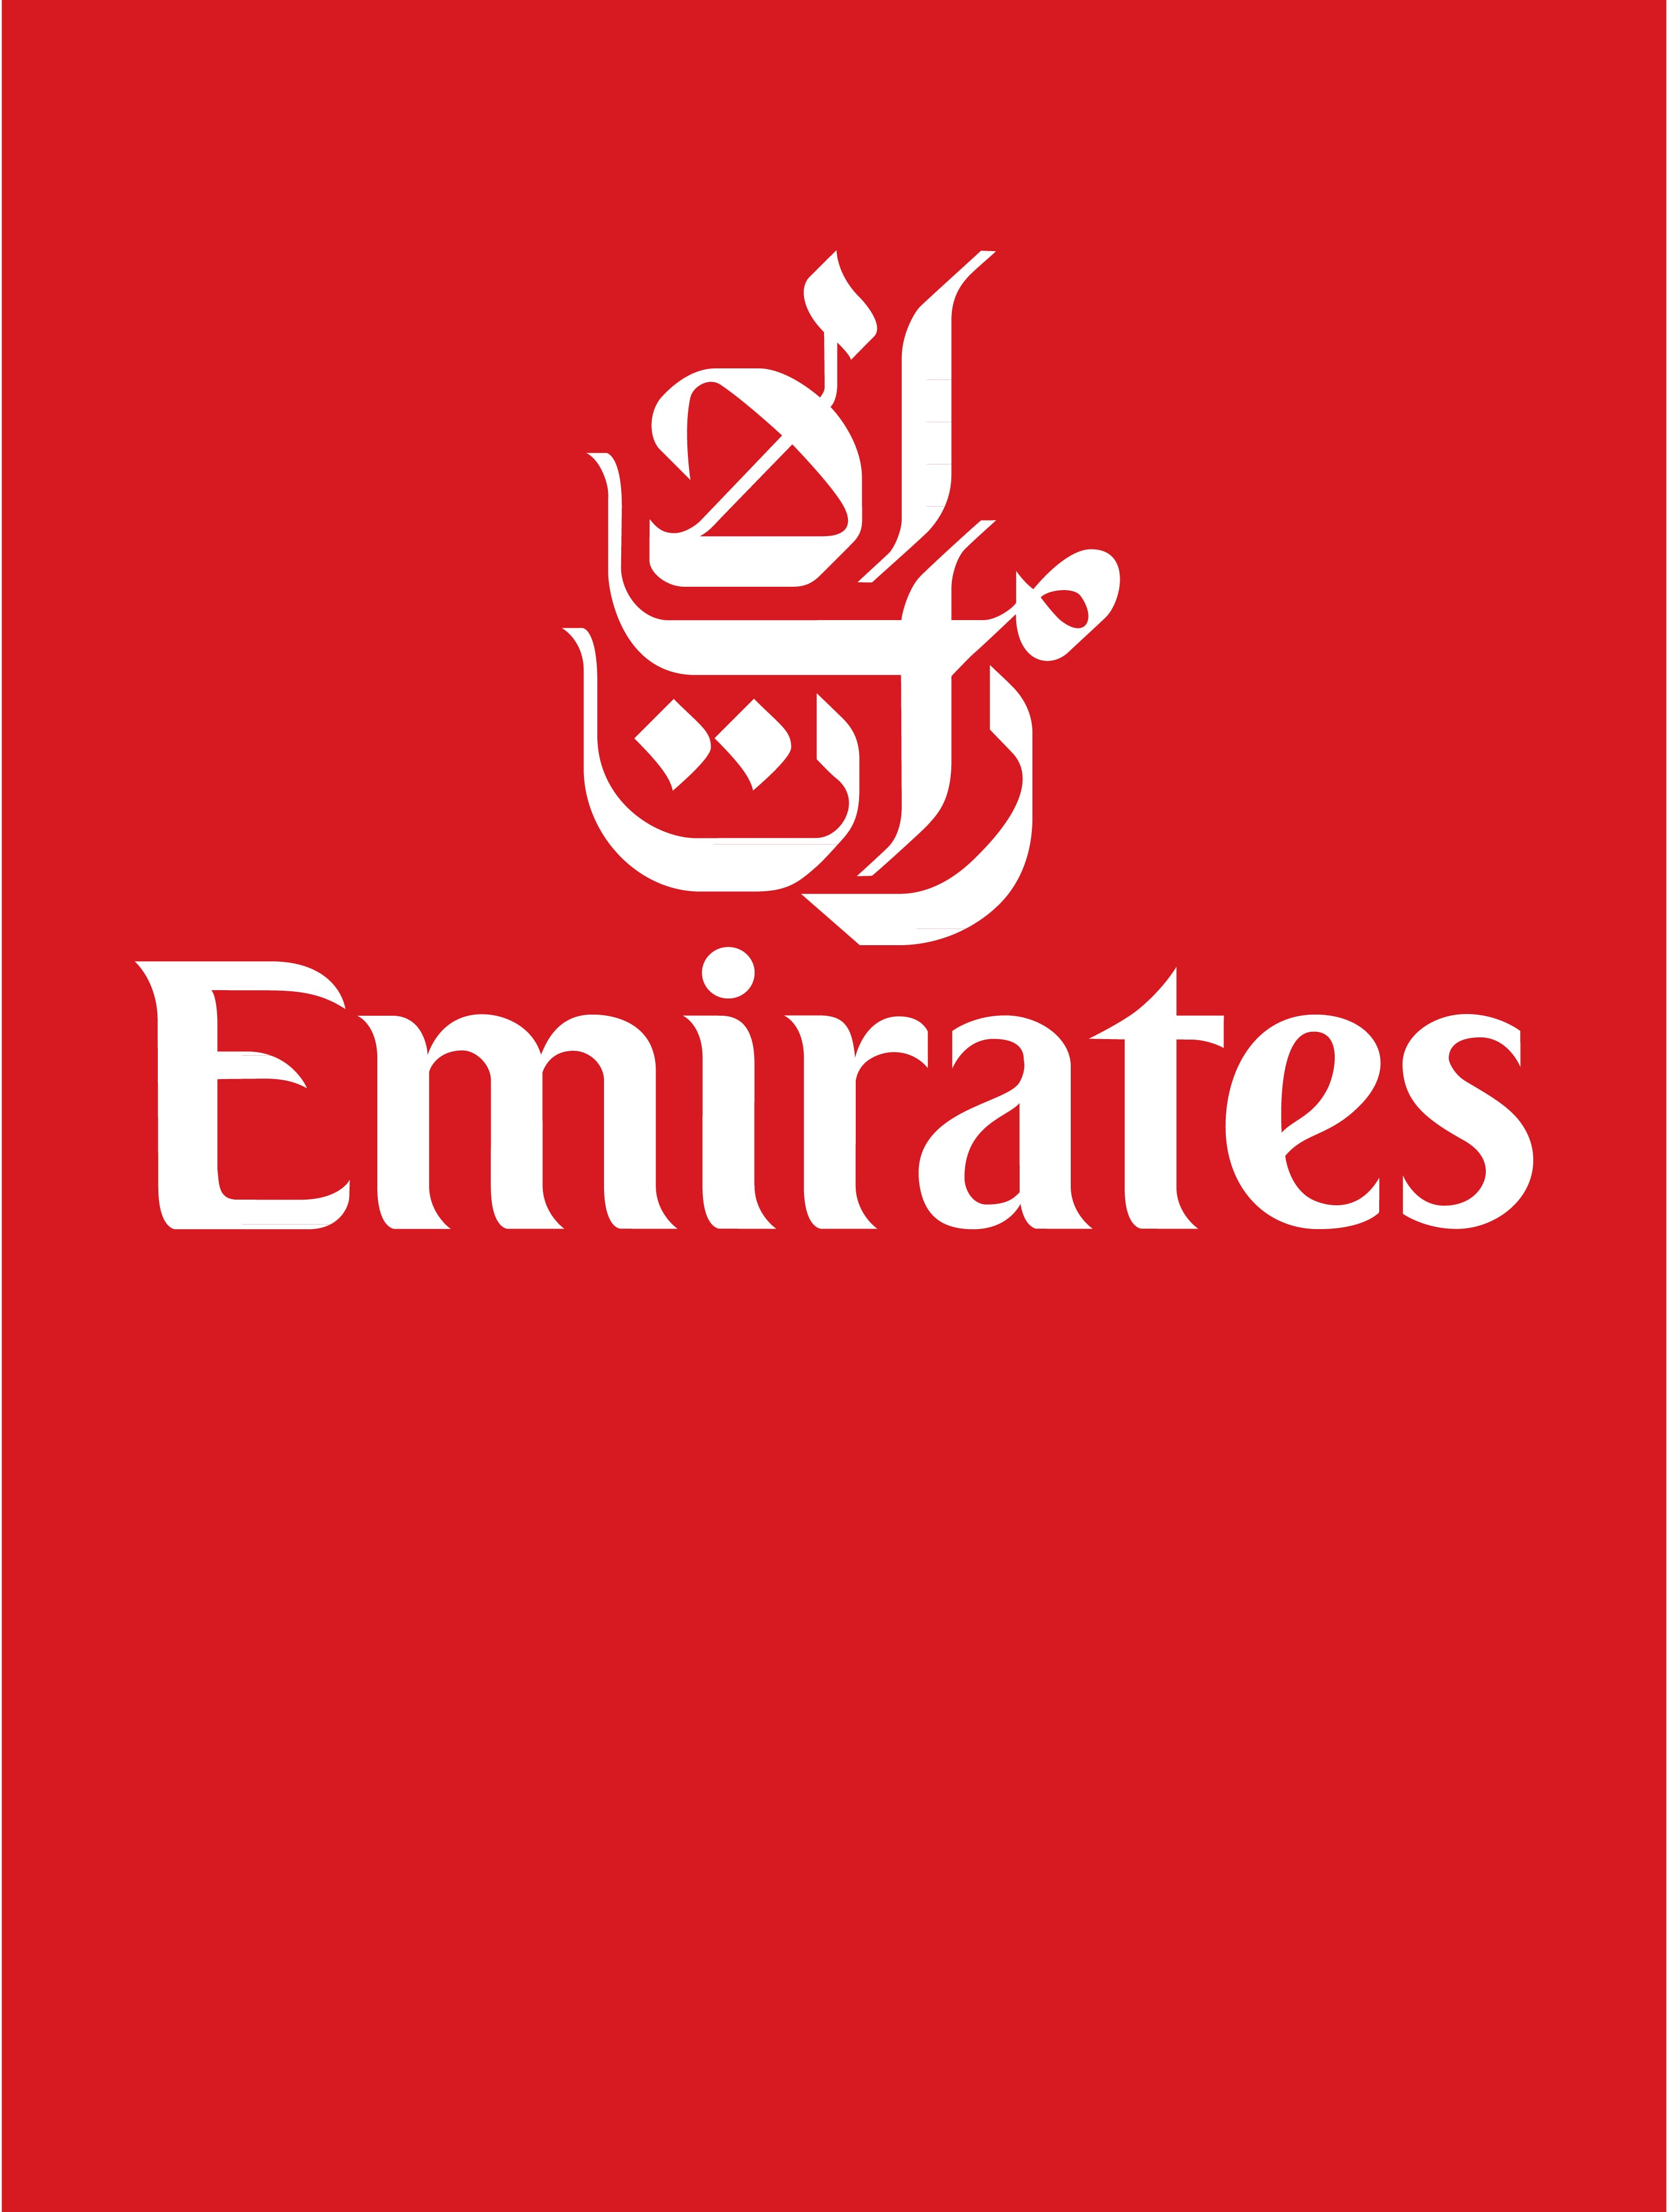 Emirates New York (JFK) to Milan (MXP) 2 roundtrip tickets for $899